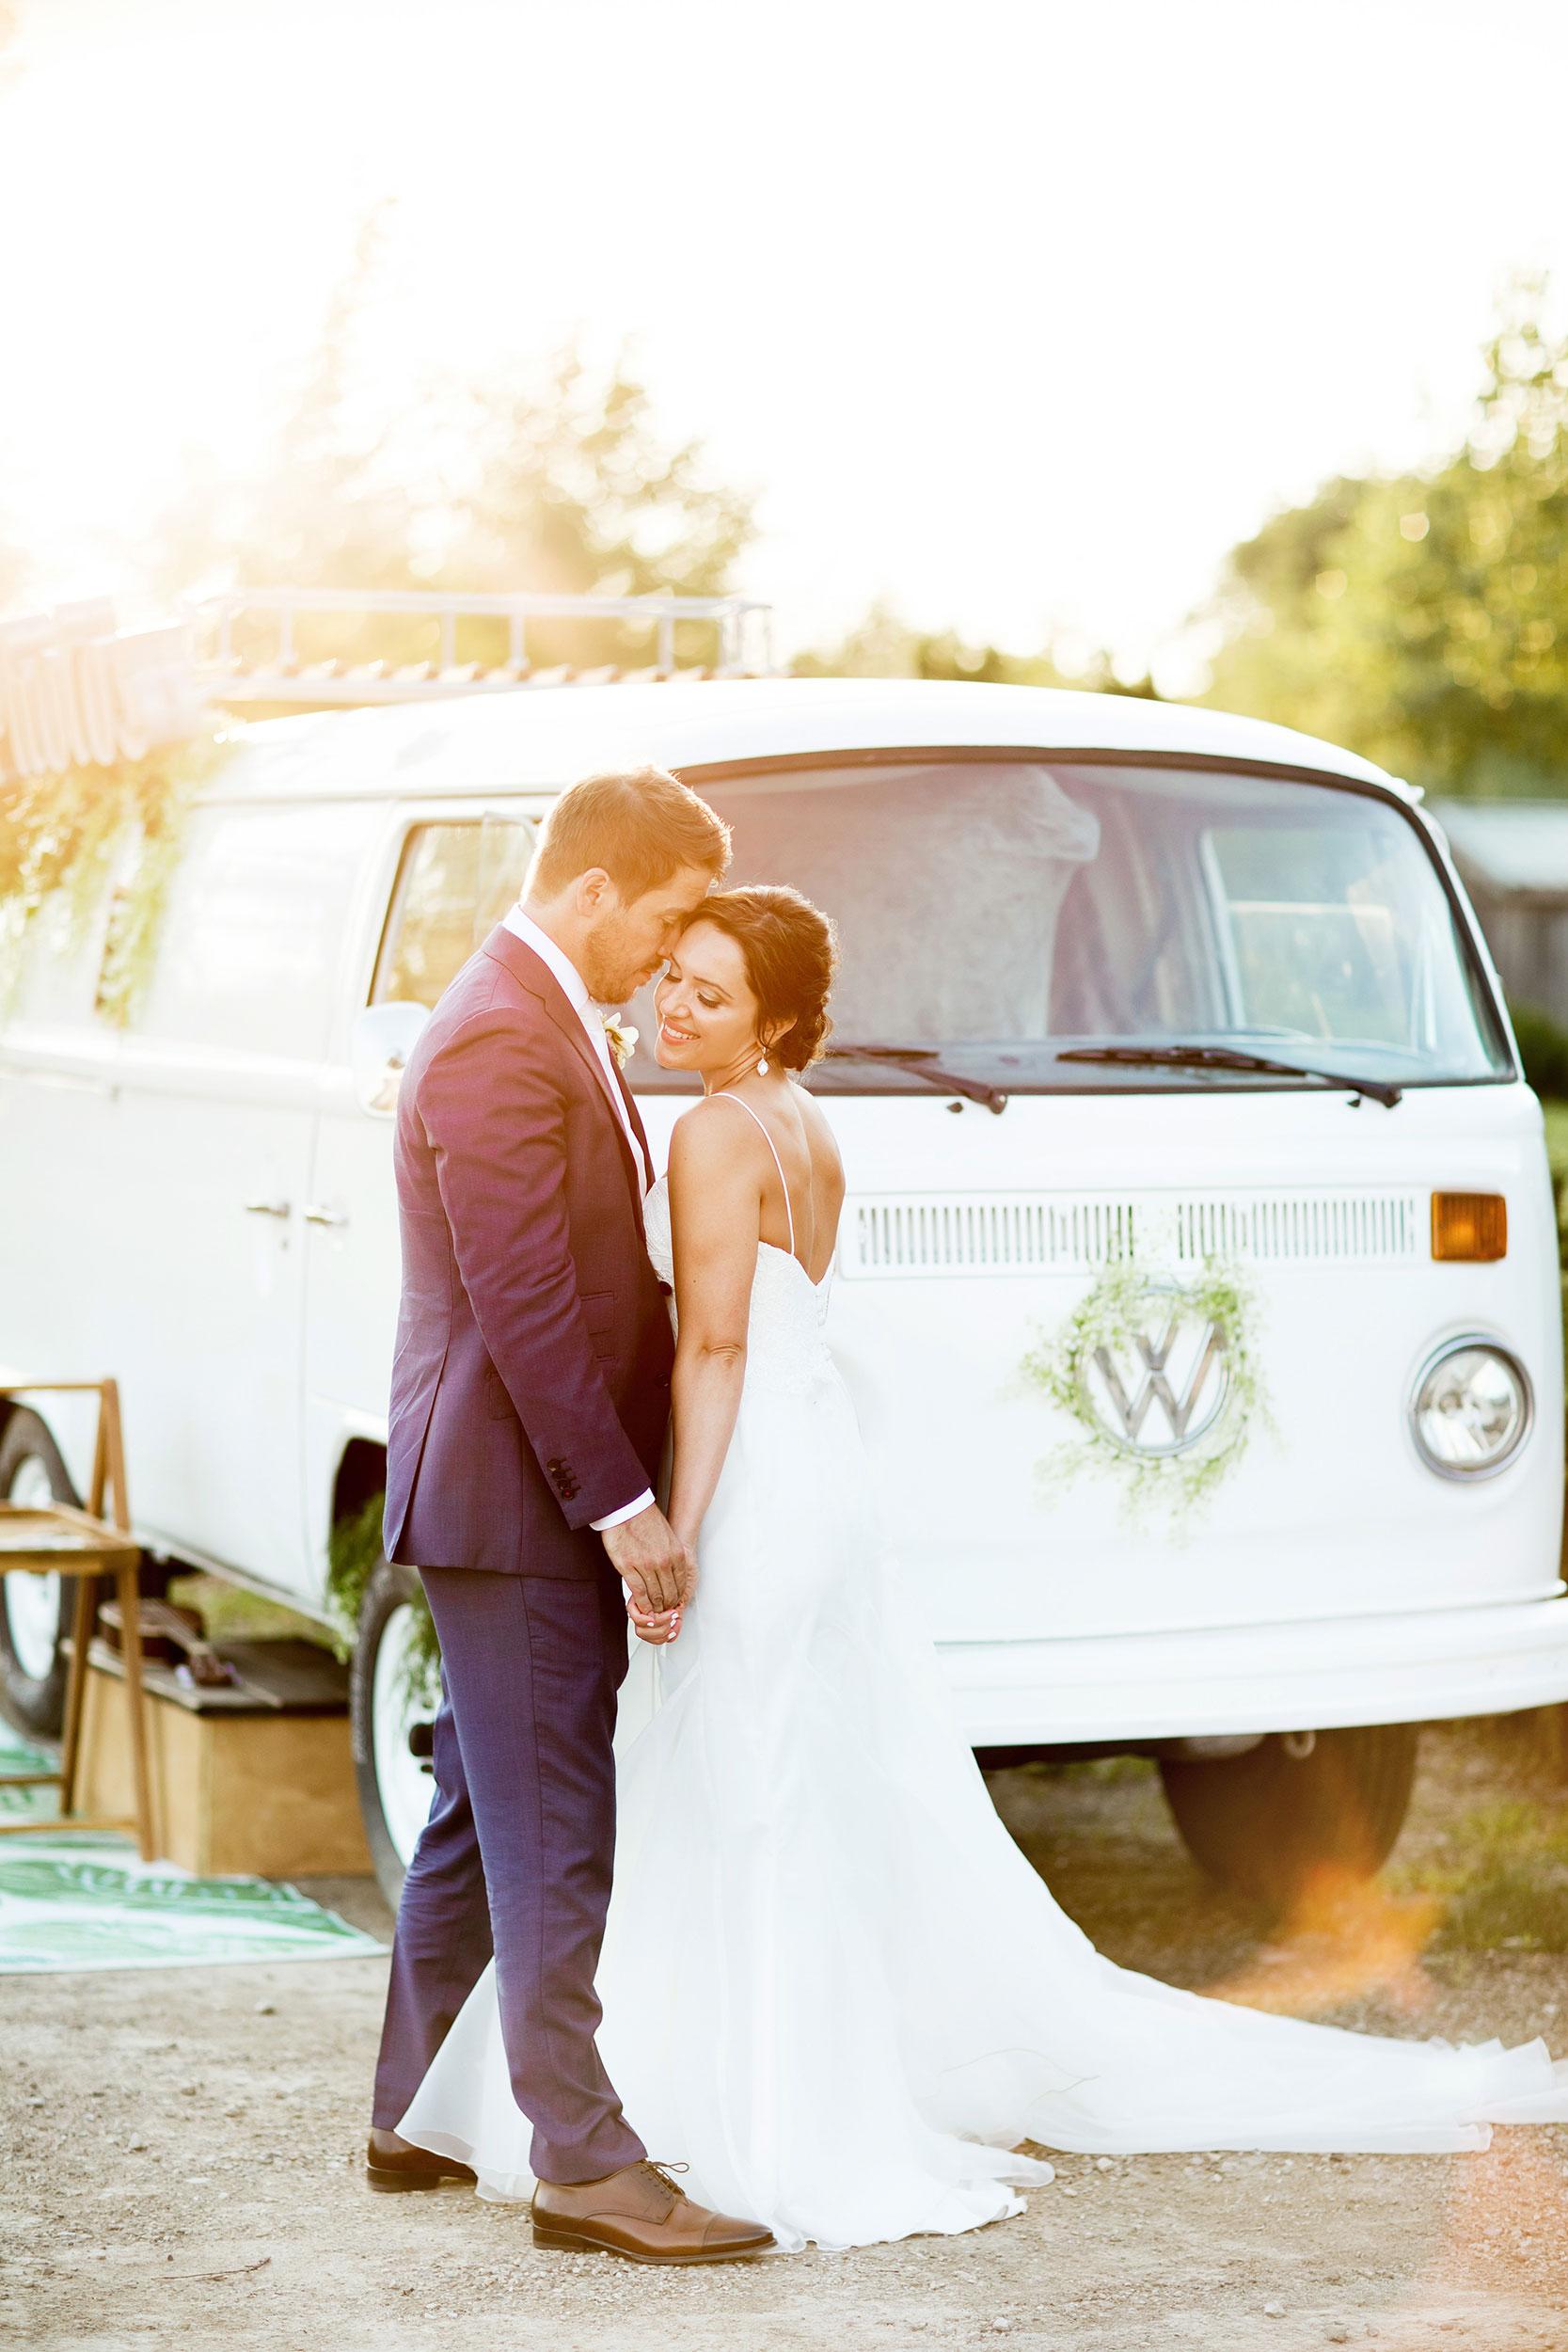 stylish-wedding-photography-windsor-toronto-ontario-wedding-photographer-sprucewood-winery-eryn-shea-photography-34.JPG